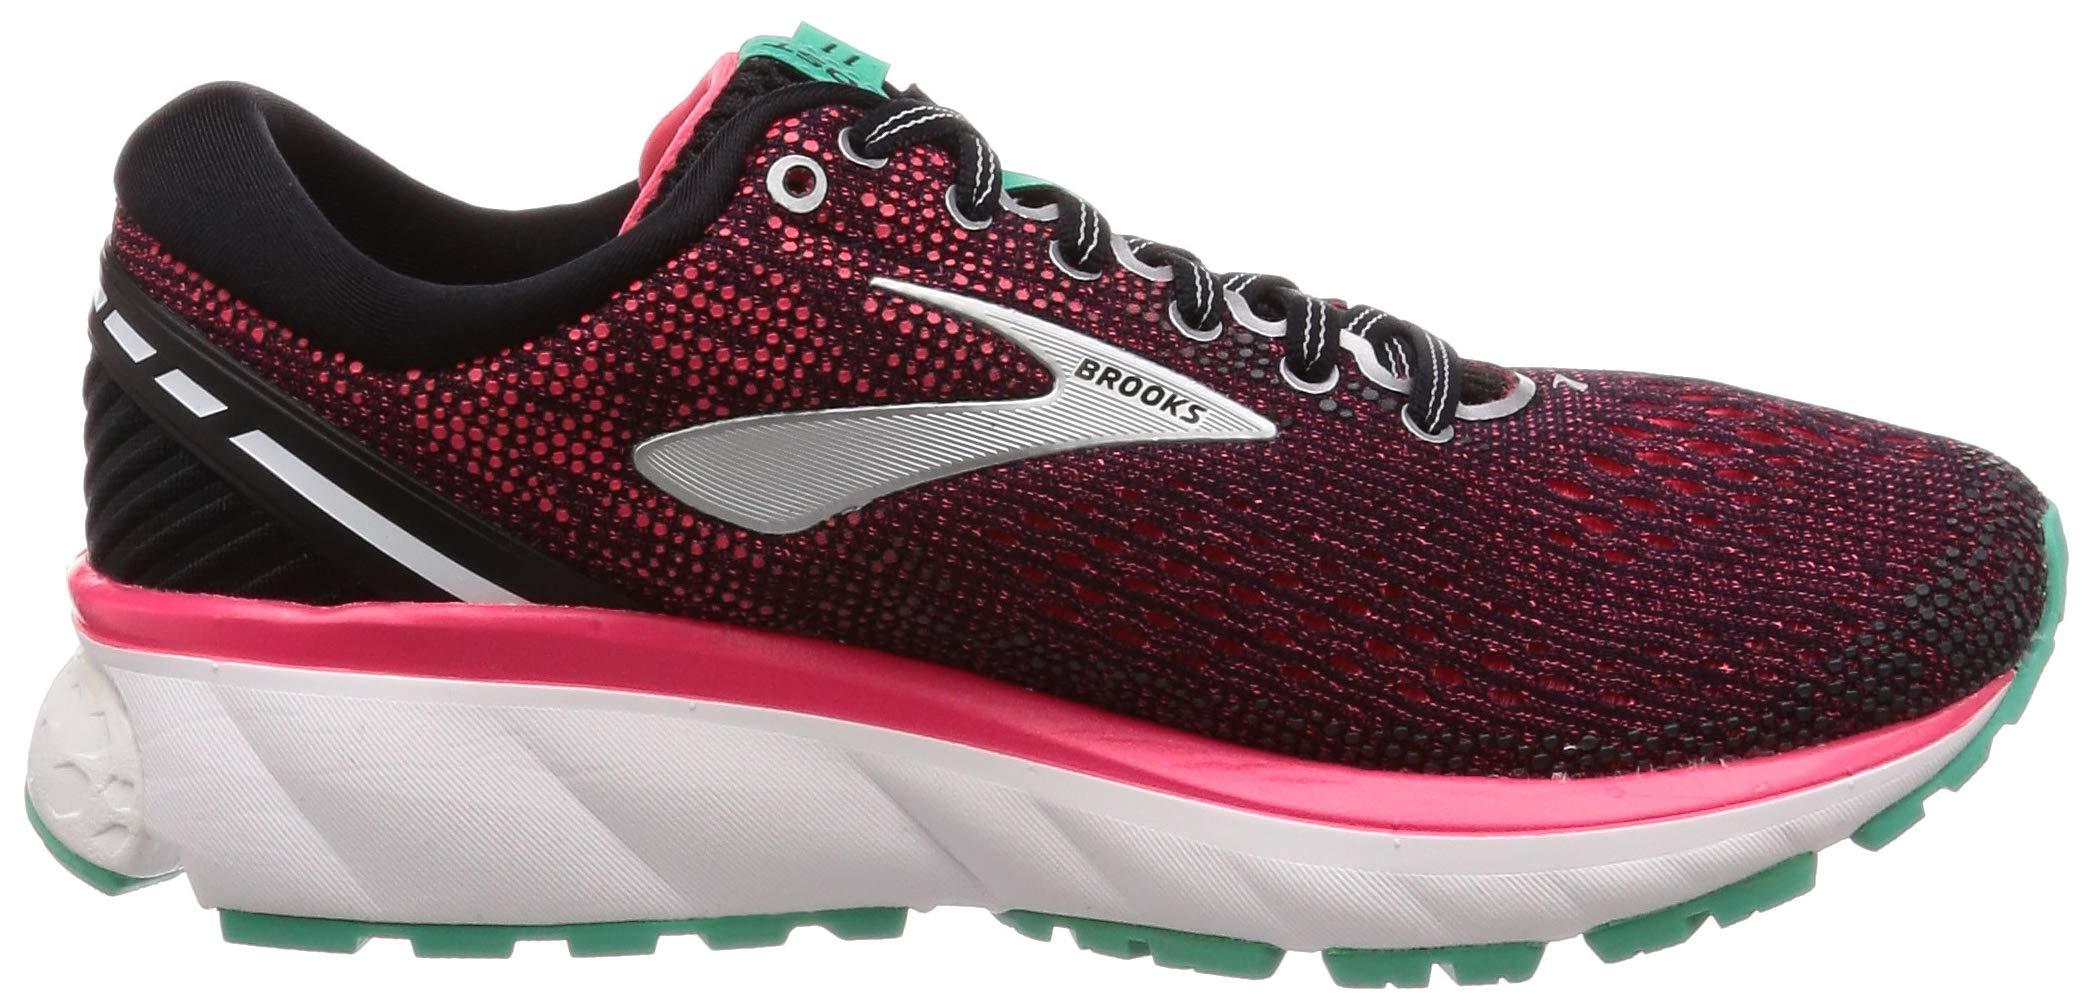 Brooks Womens Ghost 11 Running Shoe - Black/Pink/Aqua - D - 5.0 by Brooks (Image #6)